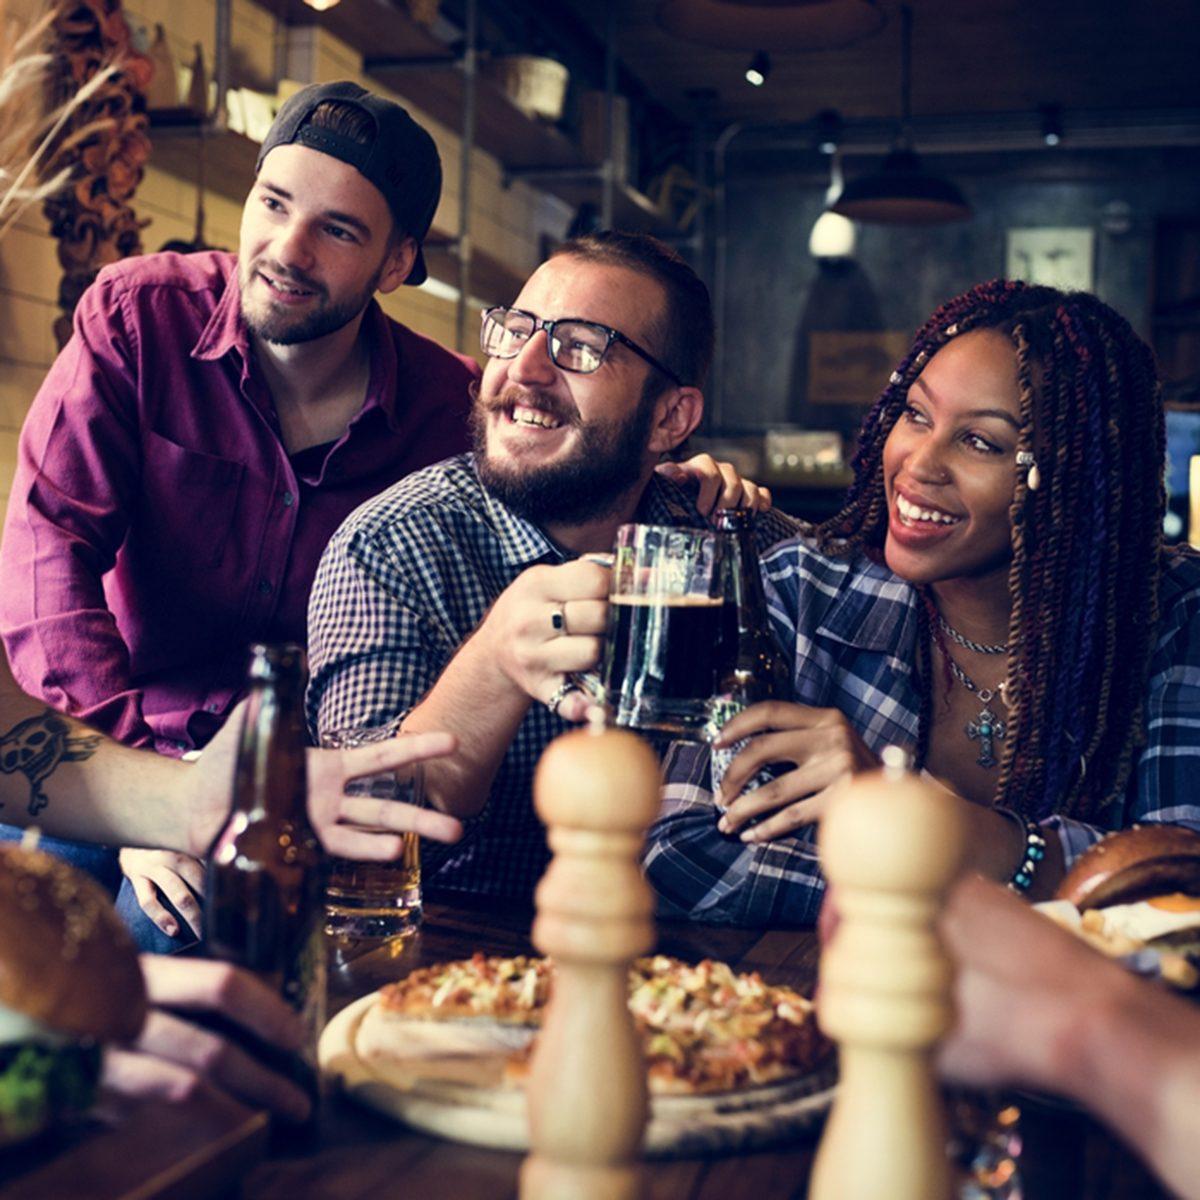 Diverse People Hang Out Pub Friendship; Shutterstock ID 570438019; Job (TFH, TOH, RD, BNB, CWM, CM): TOH